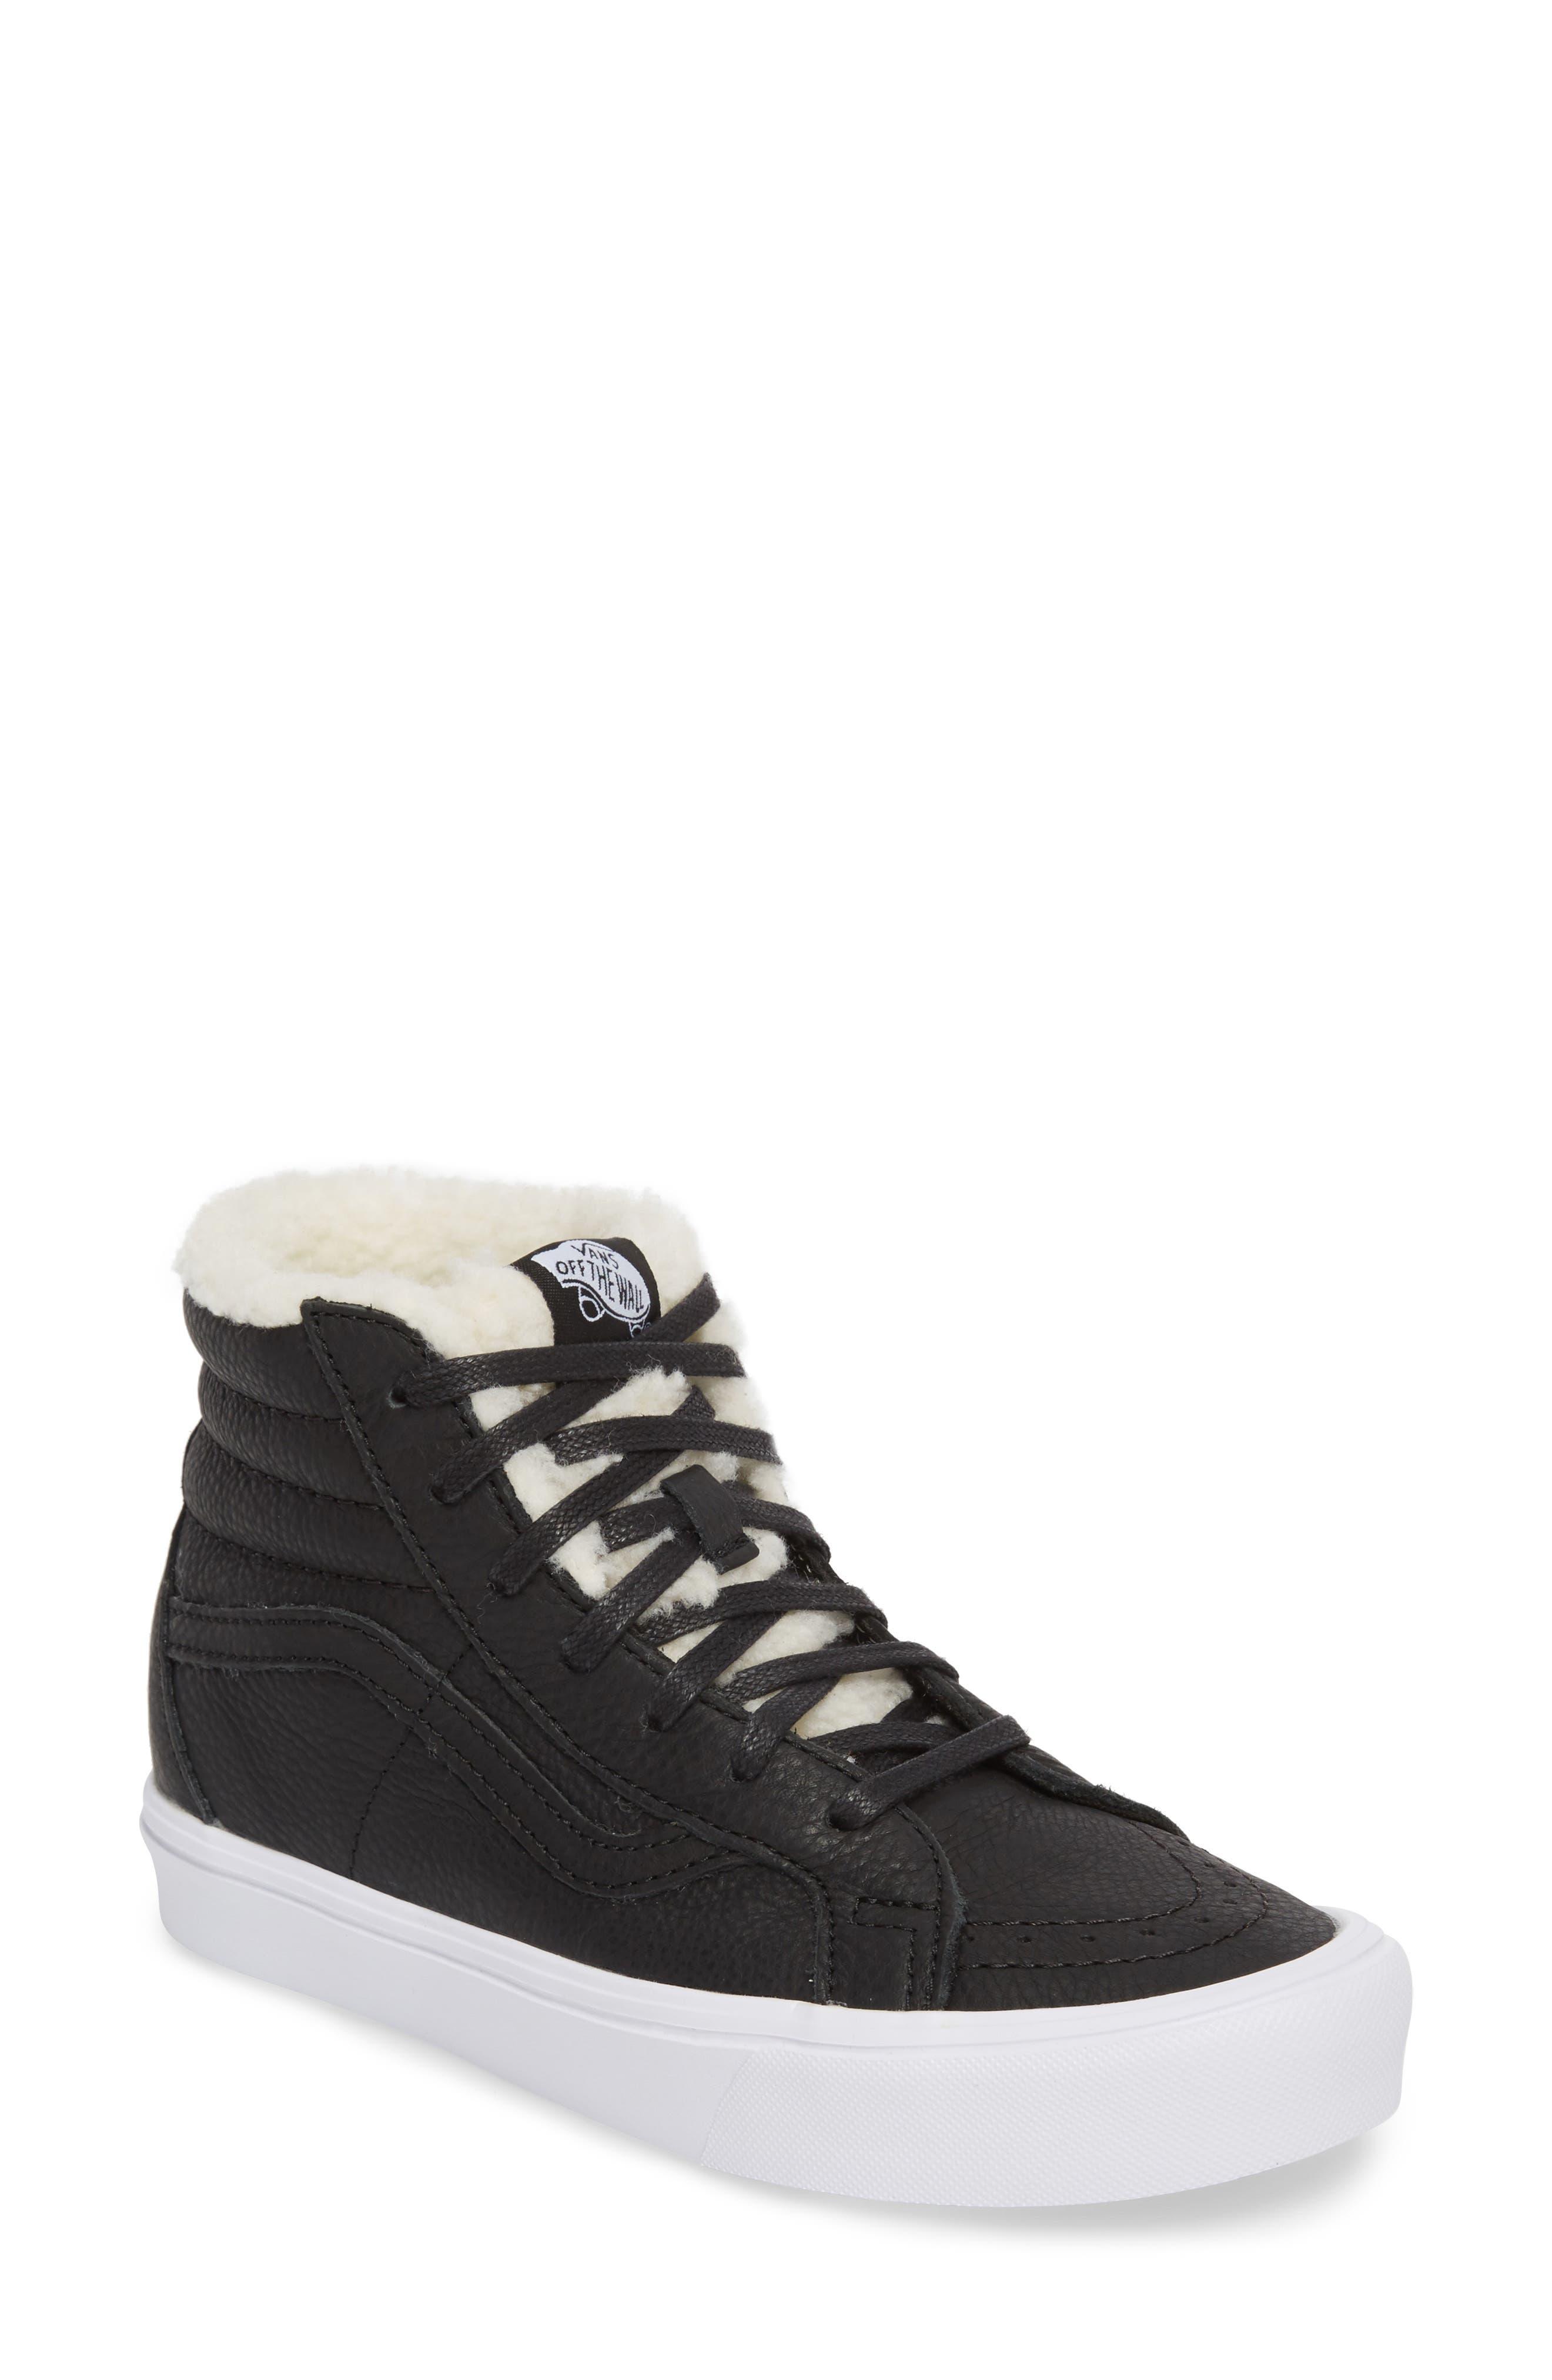 Sk8-Hi Reissue Lite High Top Sneaker,                         Main,                         color, 001